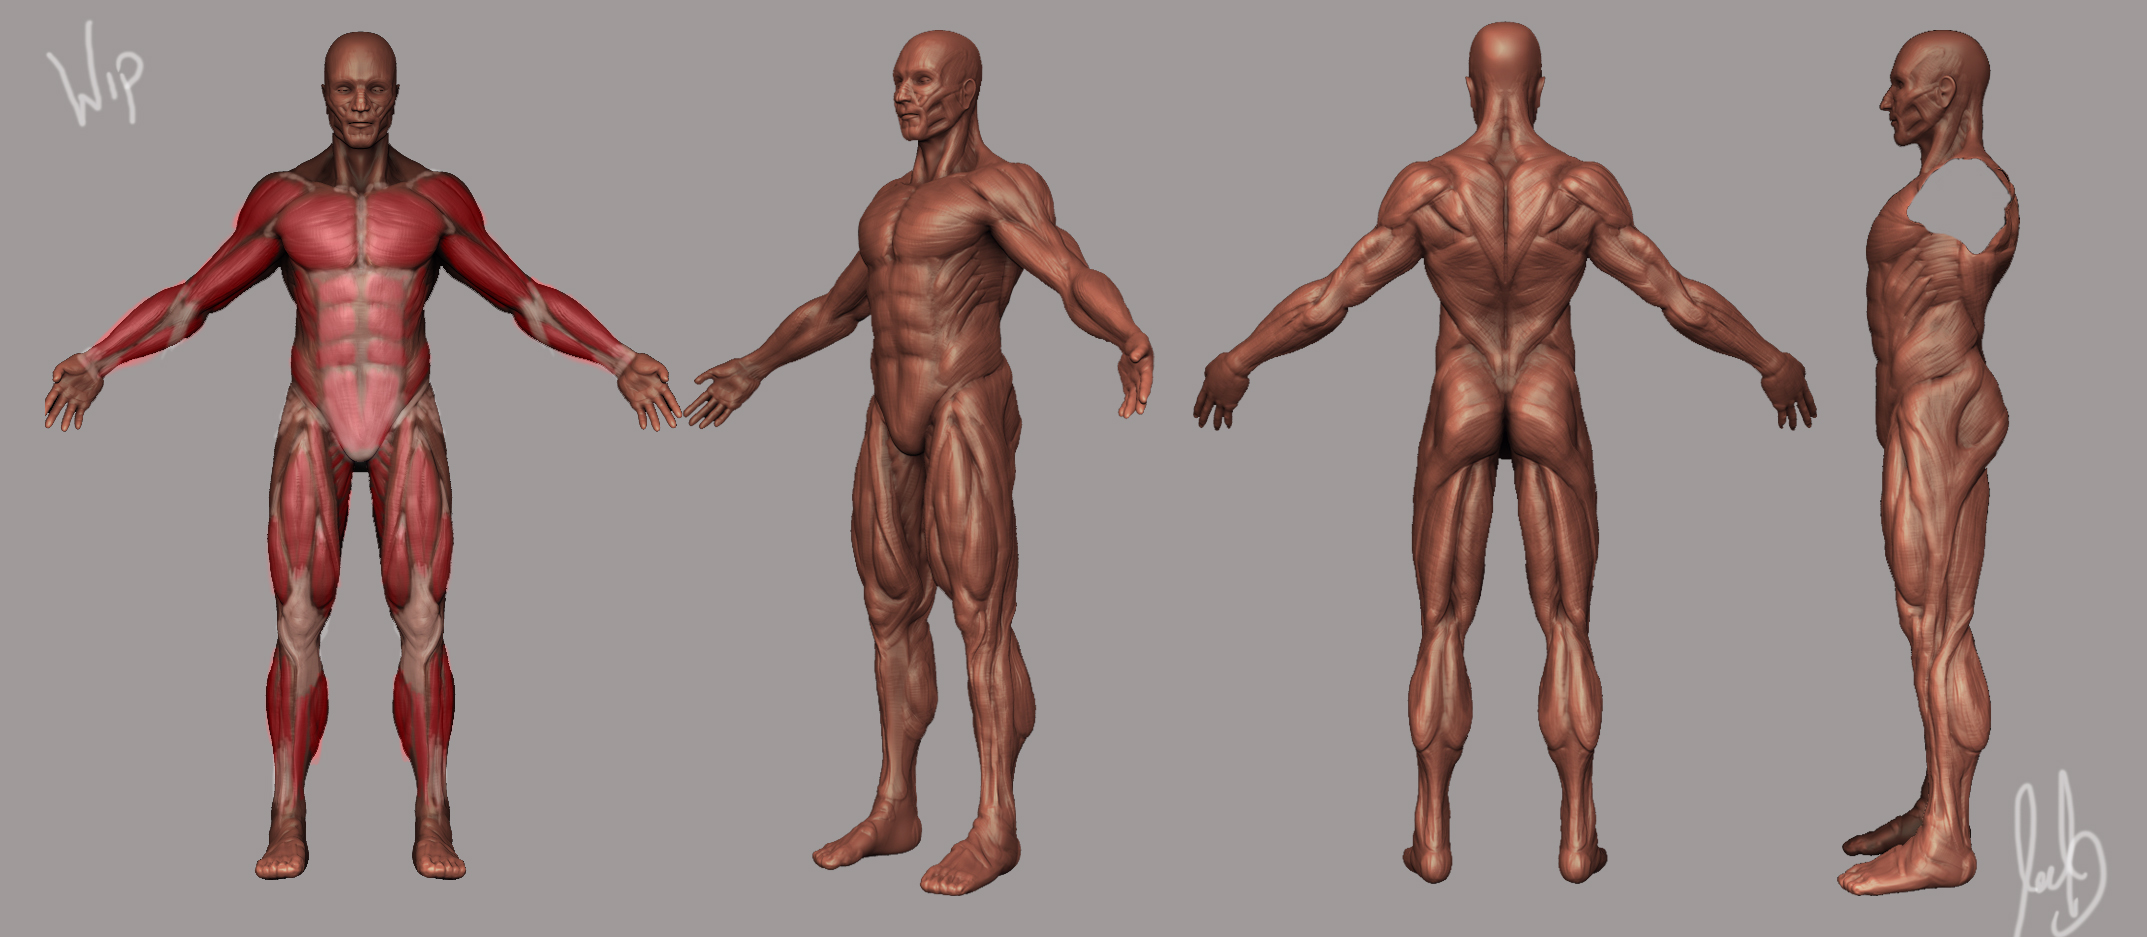 my sculpts, Muscles